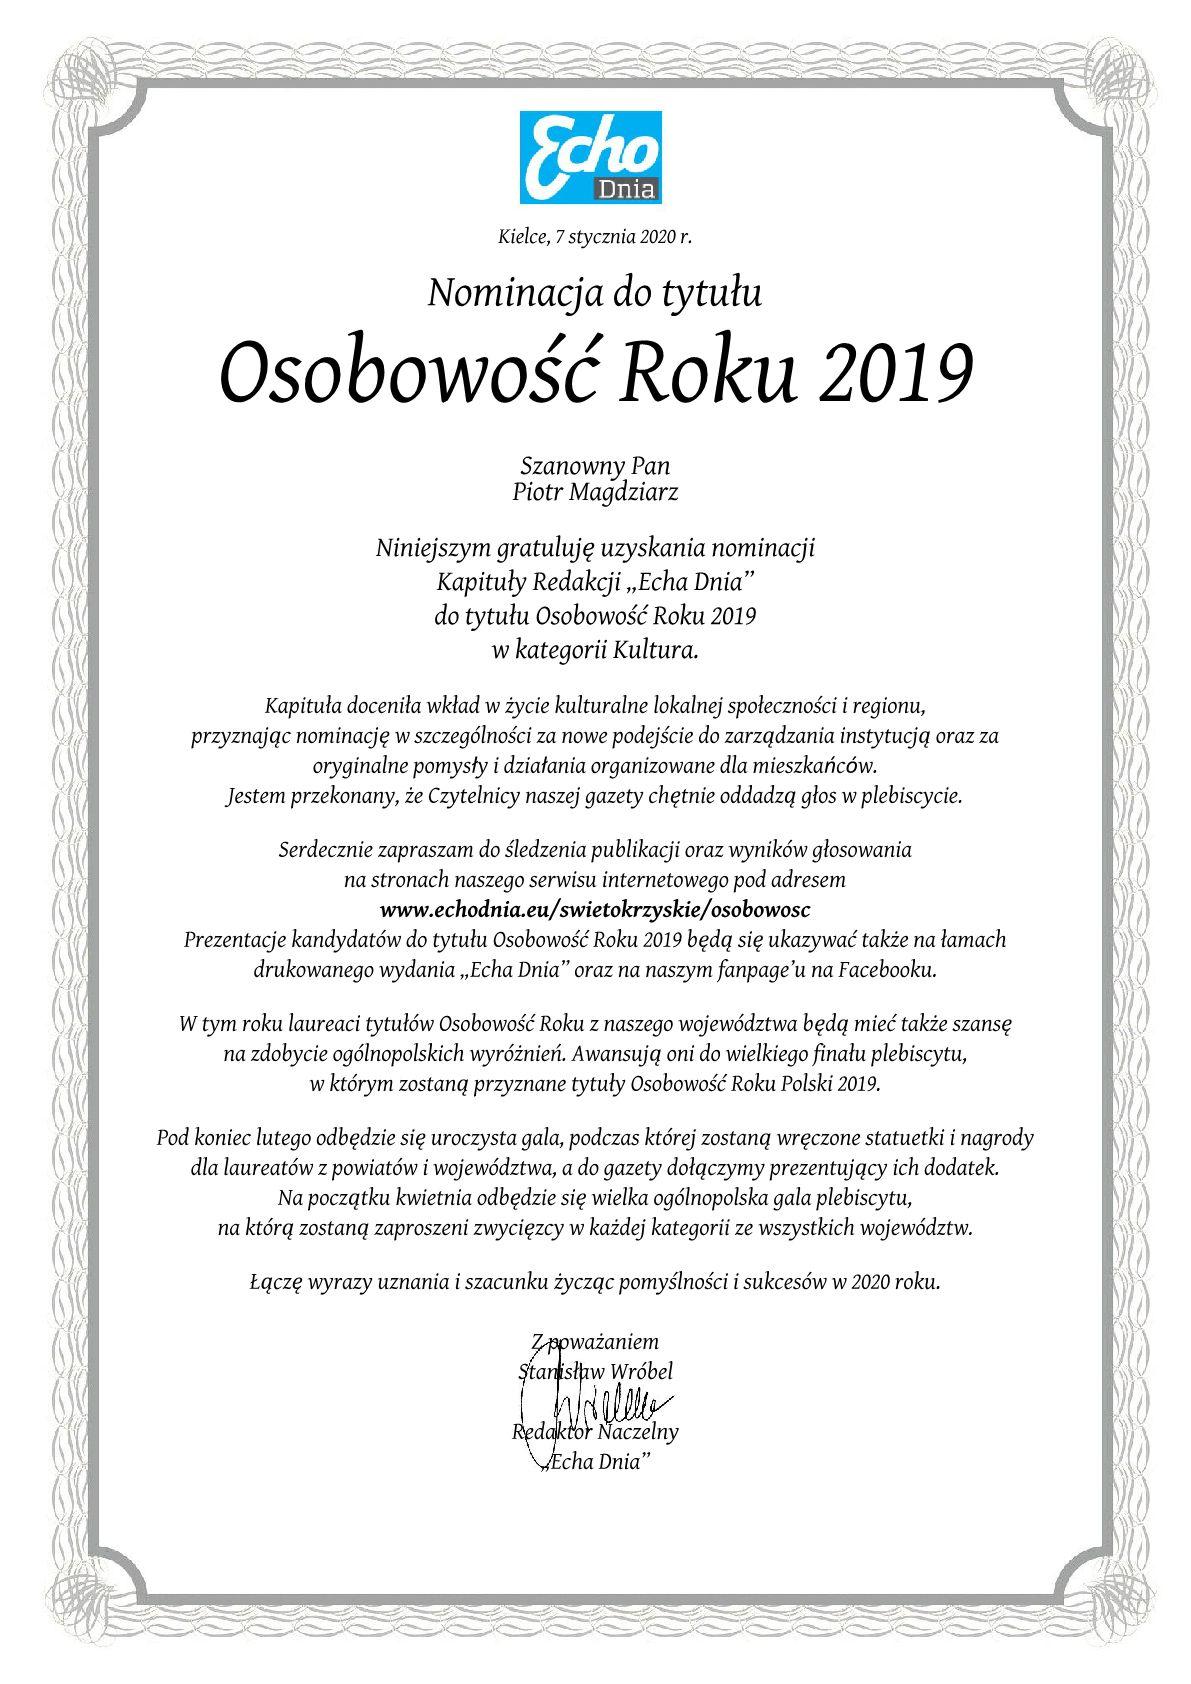 Nominacja Piotr Magdziarz